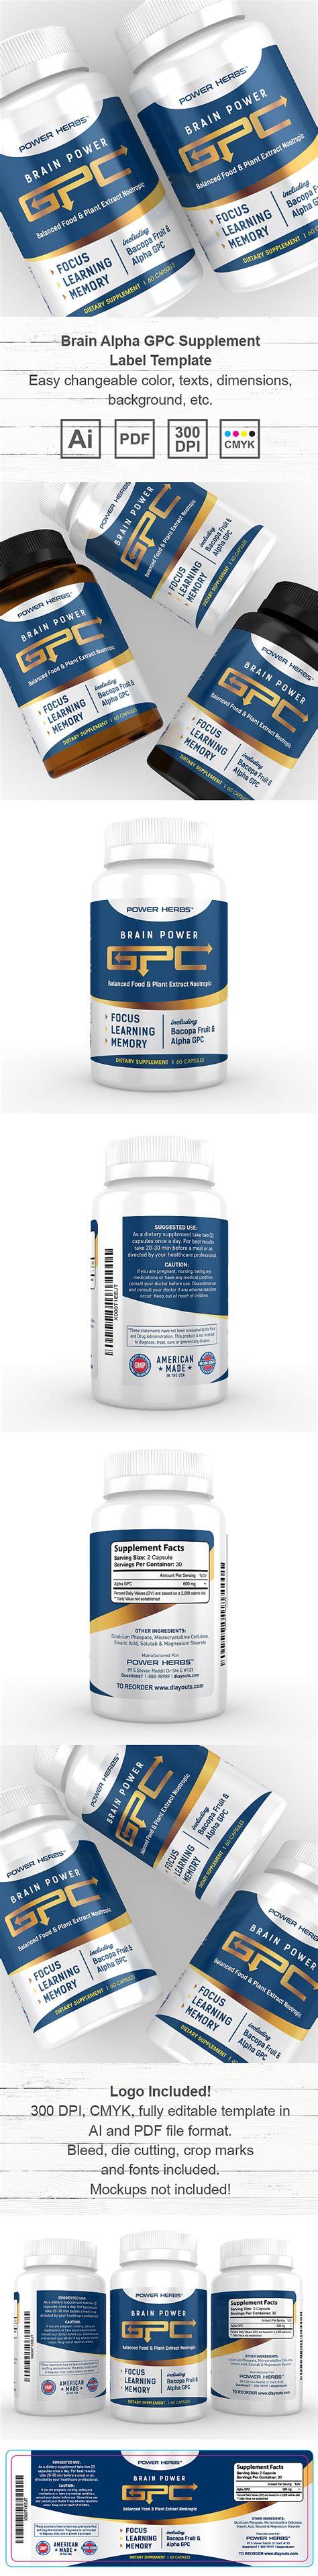 Brain Alpha Gpc Supplement Label Template Supplement Label Template